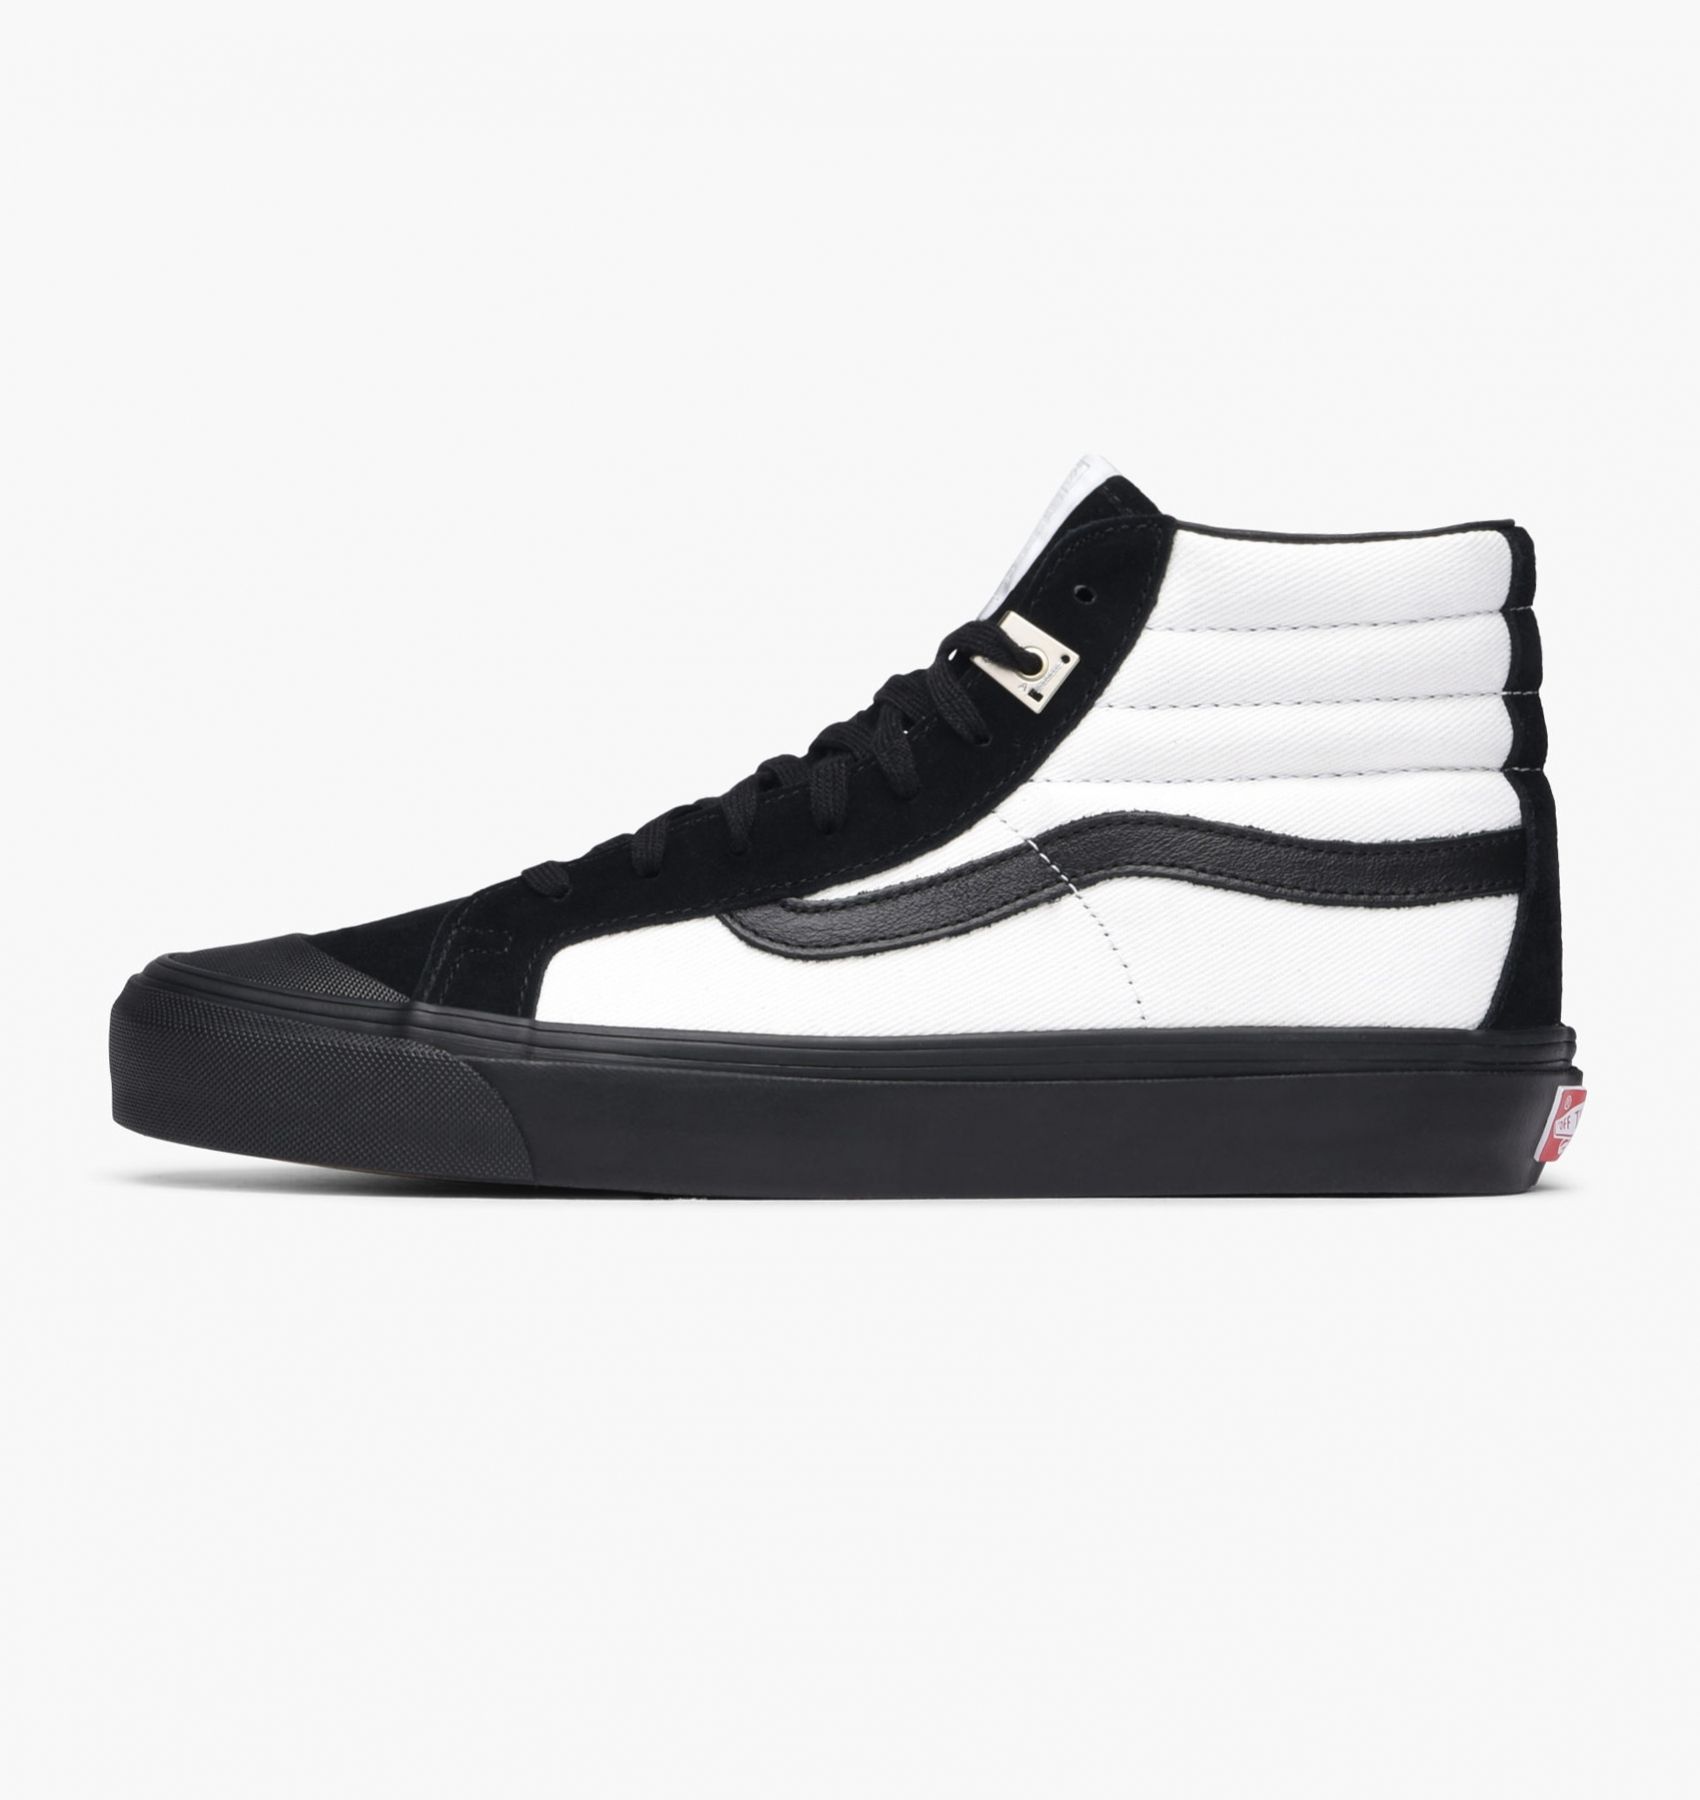 vans-vault-x-alyx-og-style-138-lx-va3dp9ok7-alyx-black-true-white